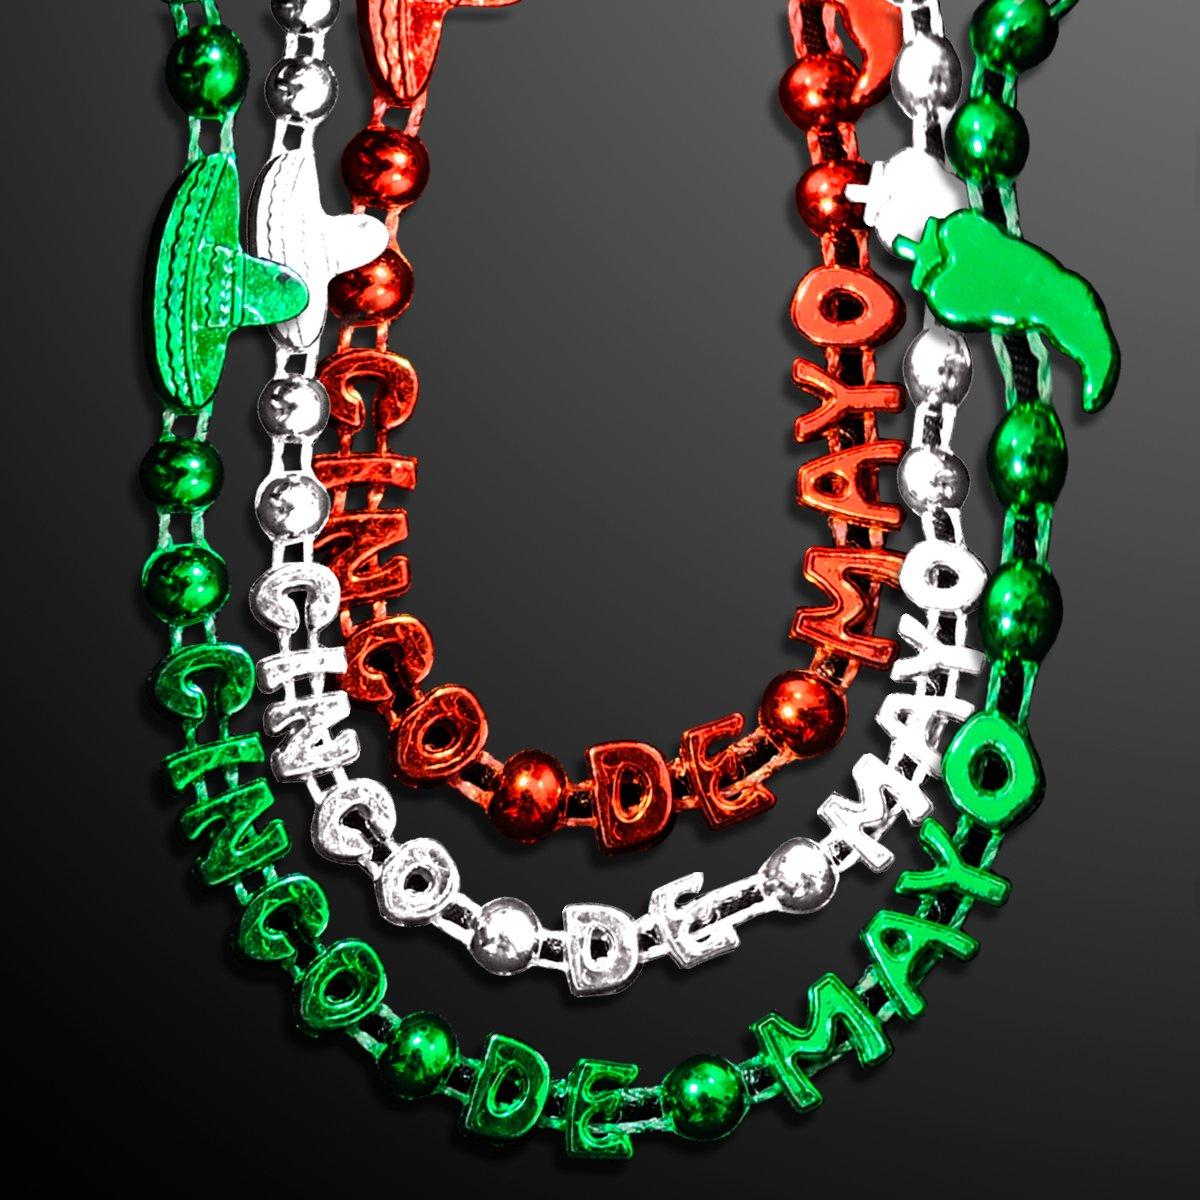 FlashingBlinkyLights Cinco de Mayo Party Bead Necklaces (Set of 144)